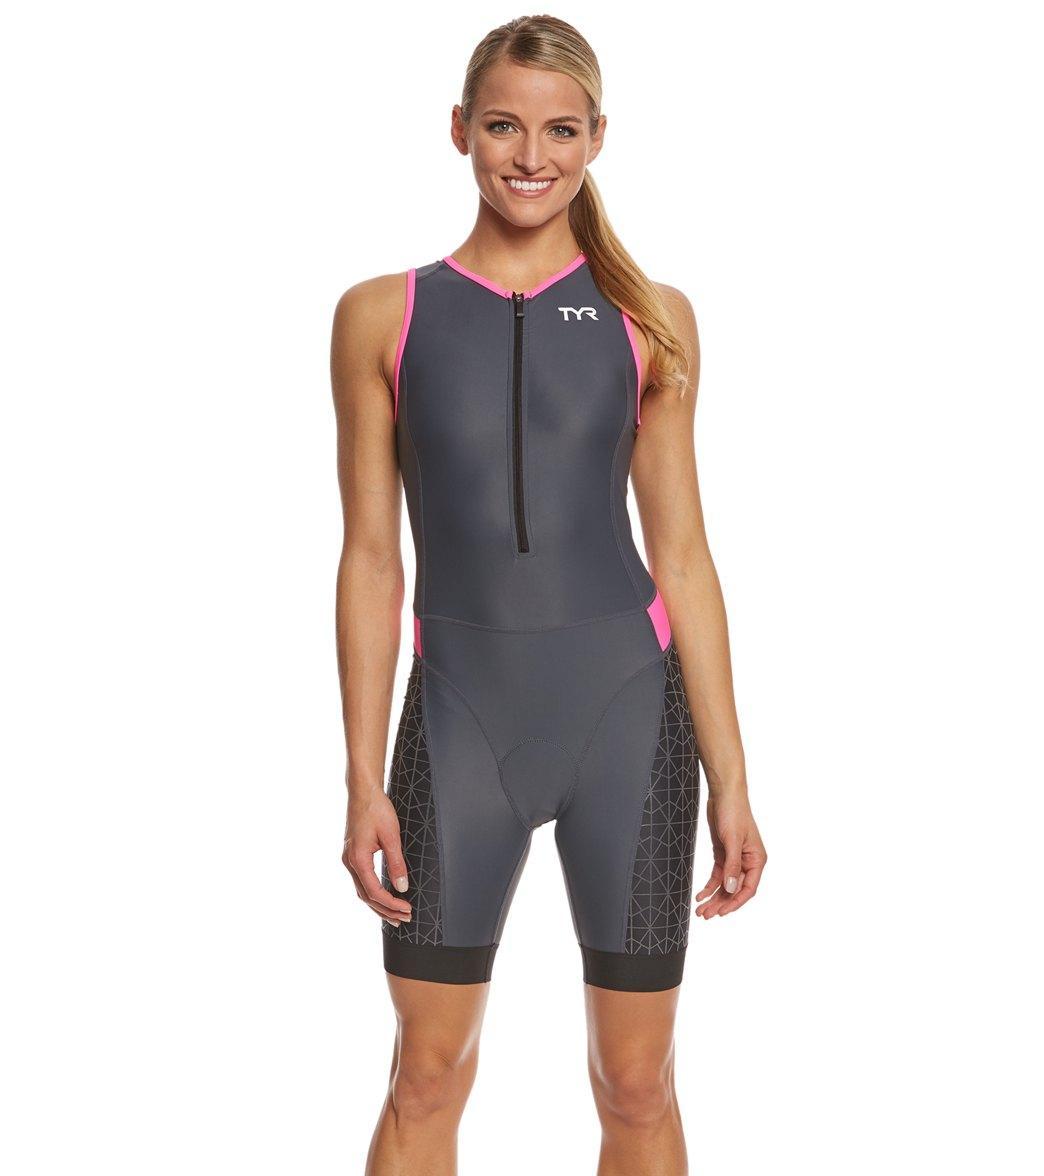 Стартовый костюм без рукавов с молнией спереди TYR Women's Competitor Padded Front Zip Tri Suit